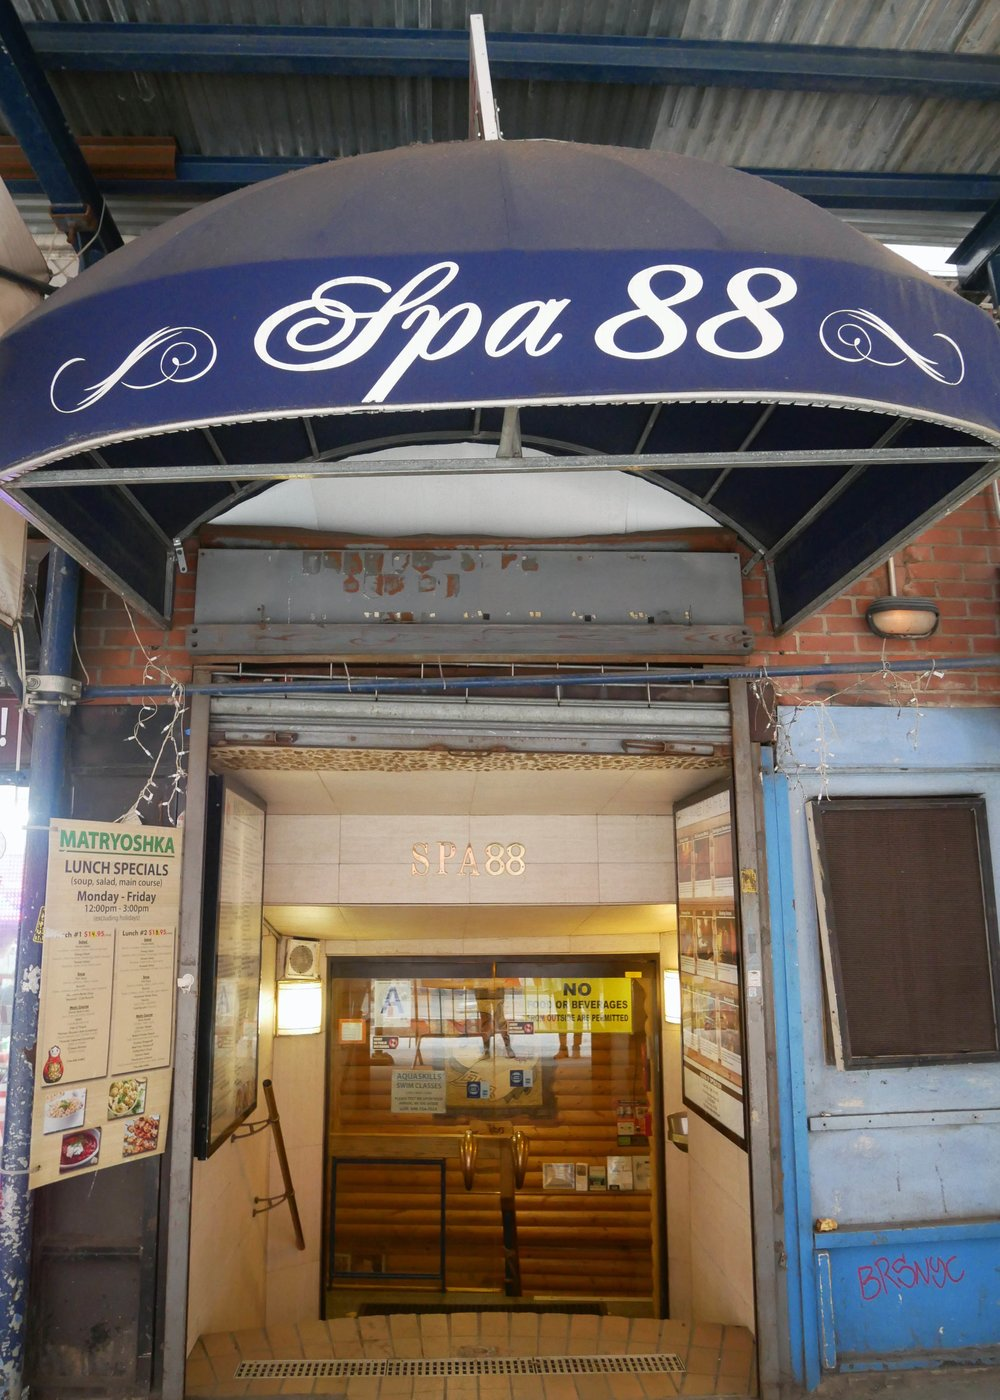 The unassuming Russian spa entrance